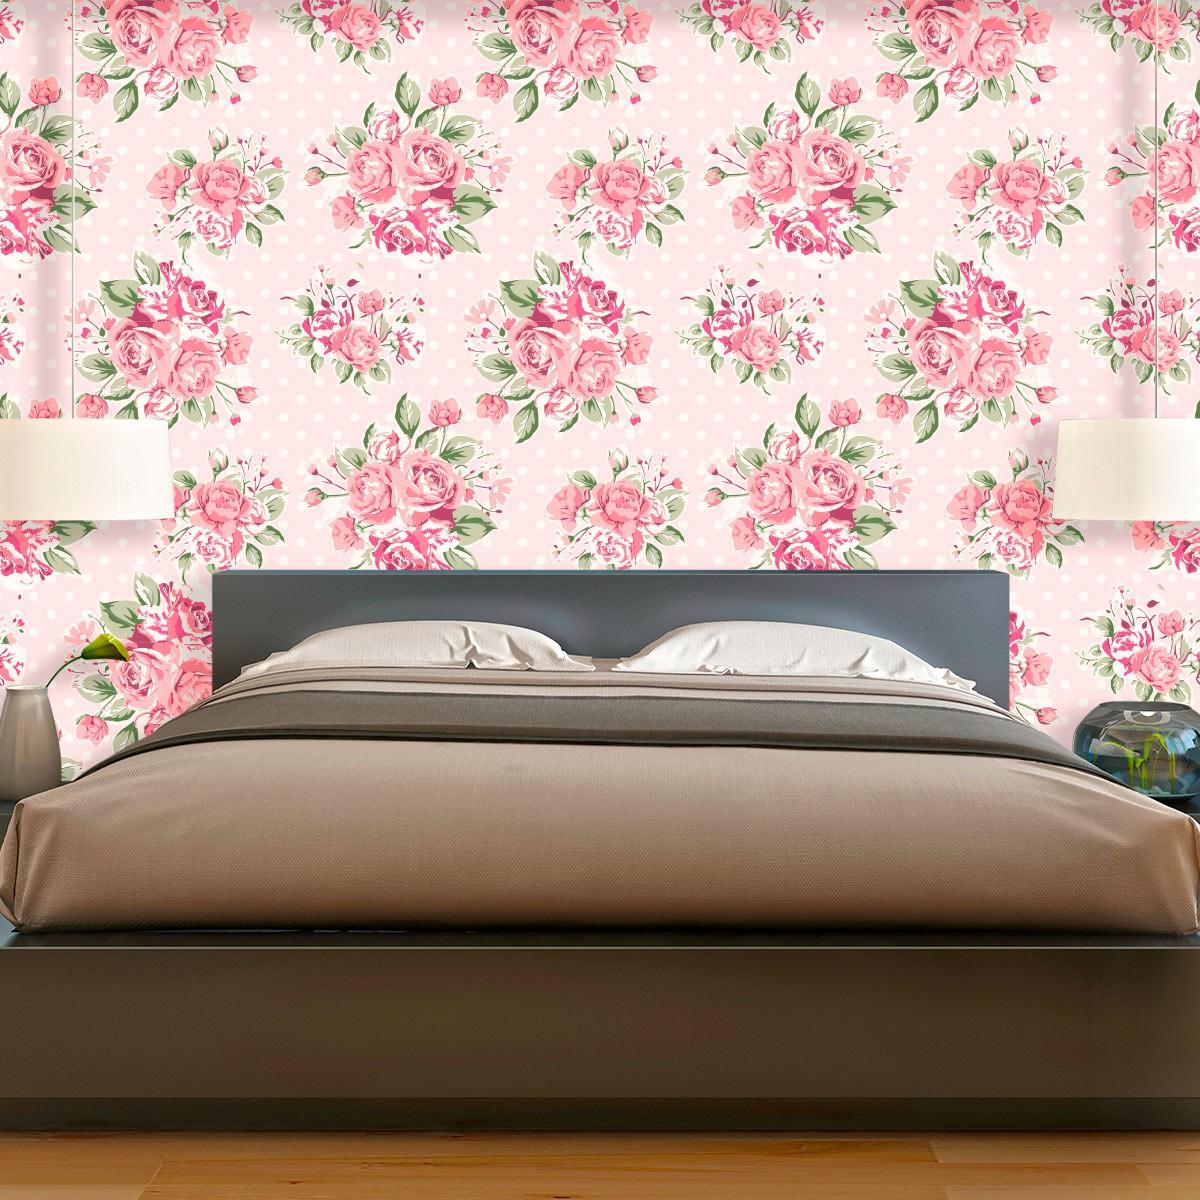 Papel de Parede Floral Buquê de Flores Rosas Poa Adesivo